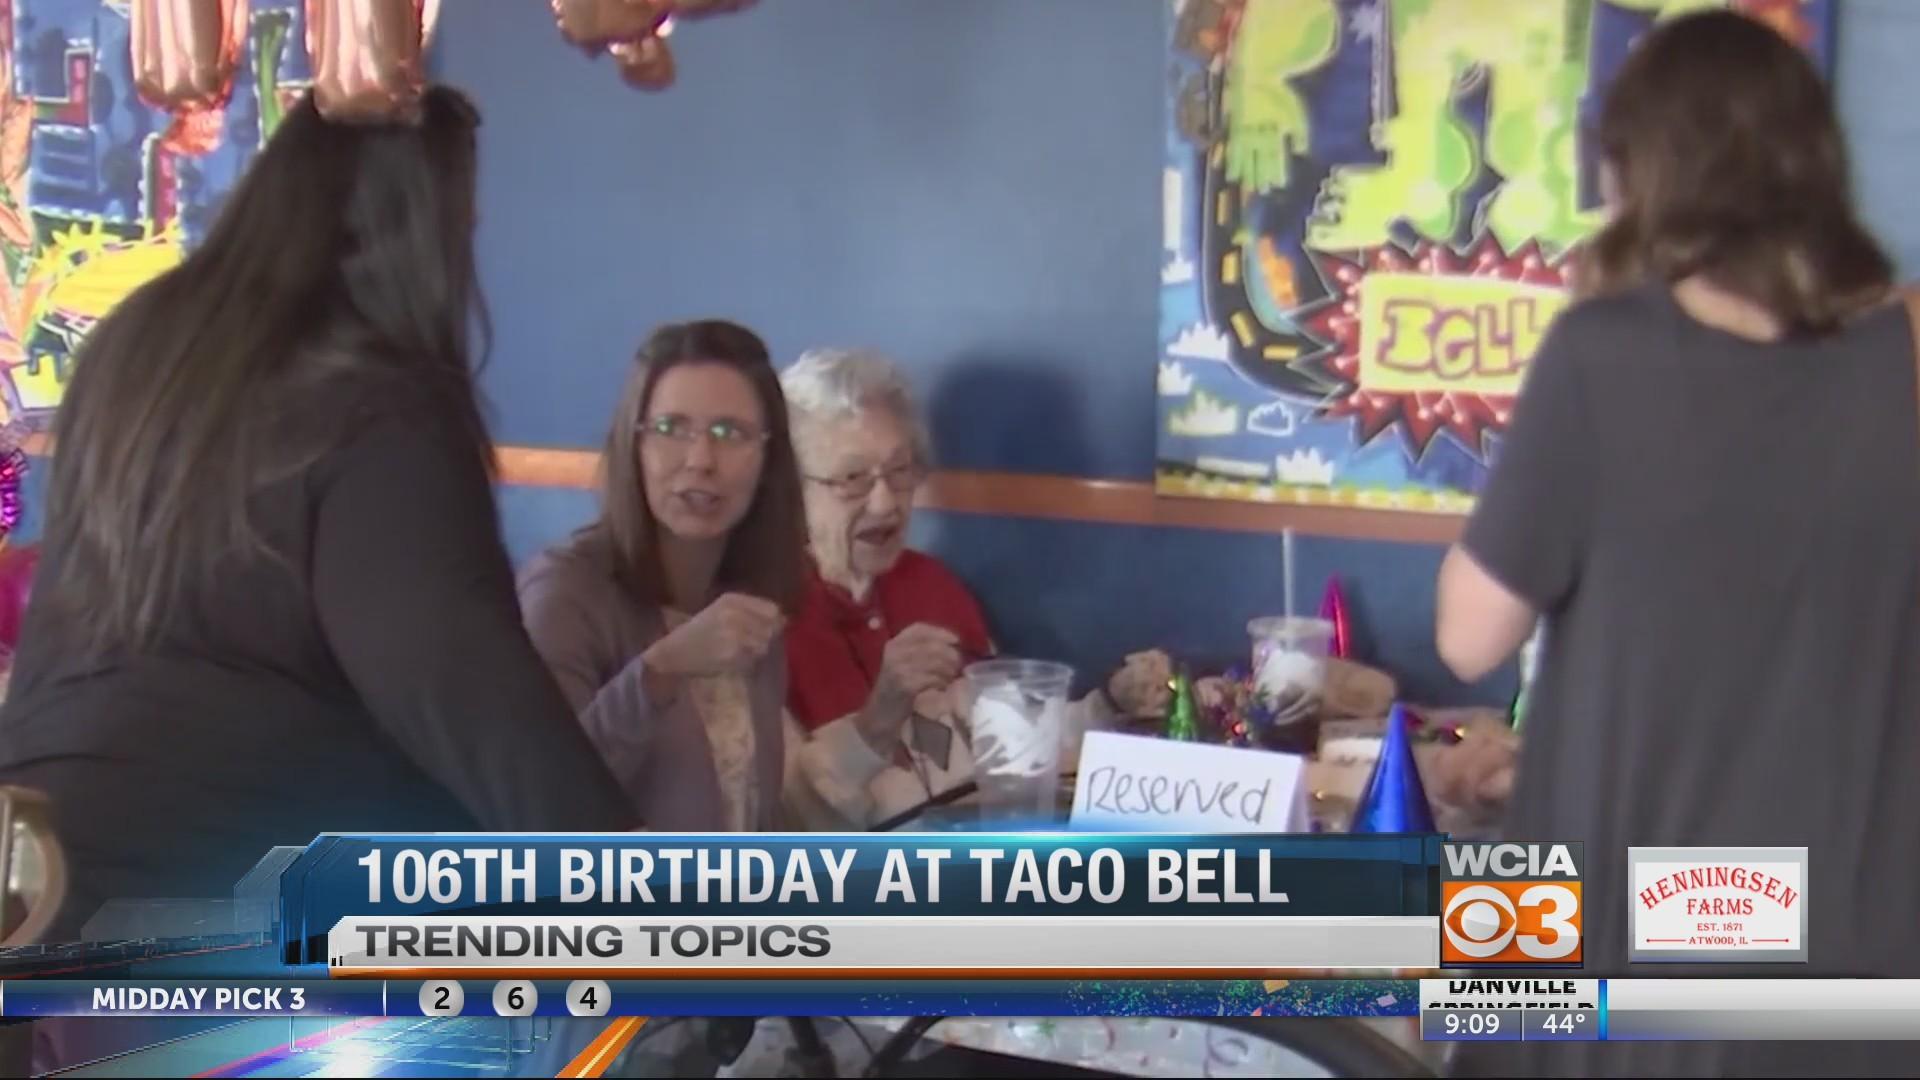 Taco bell birthday